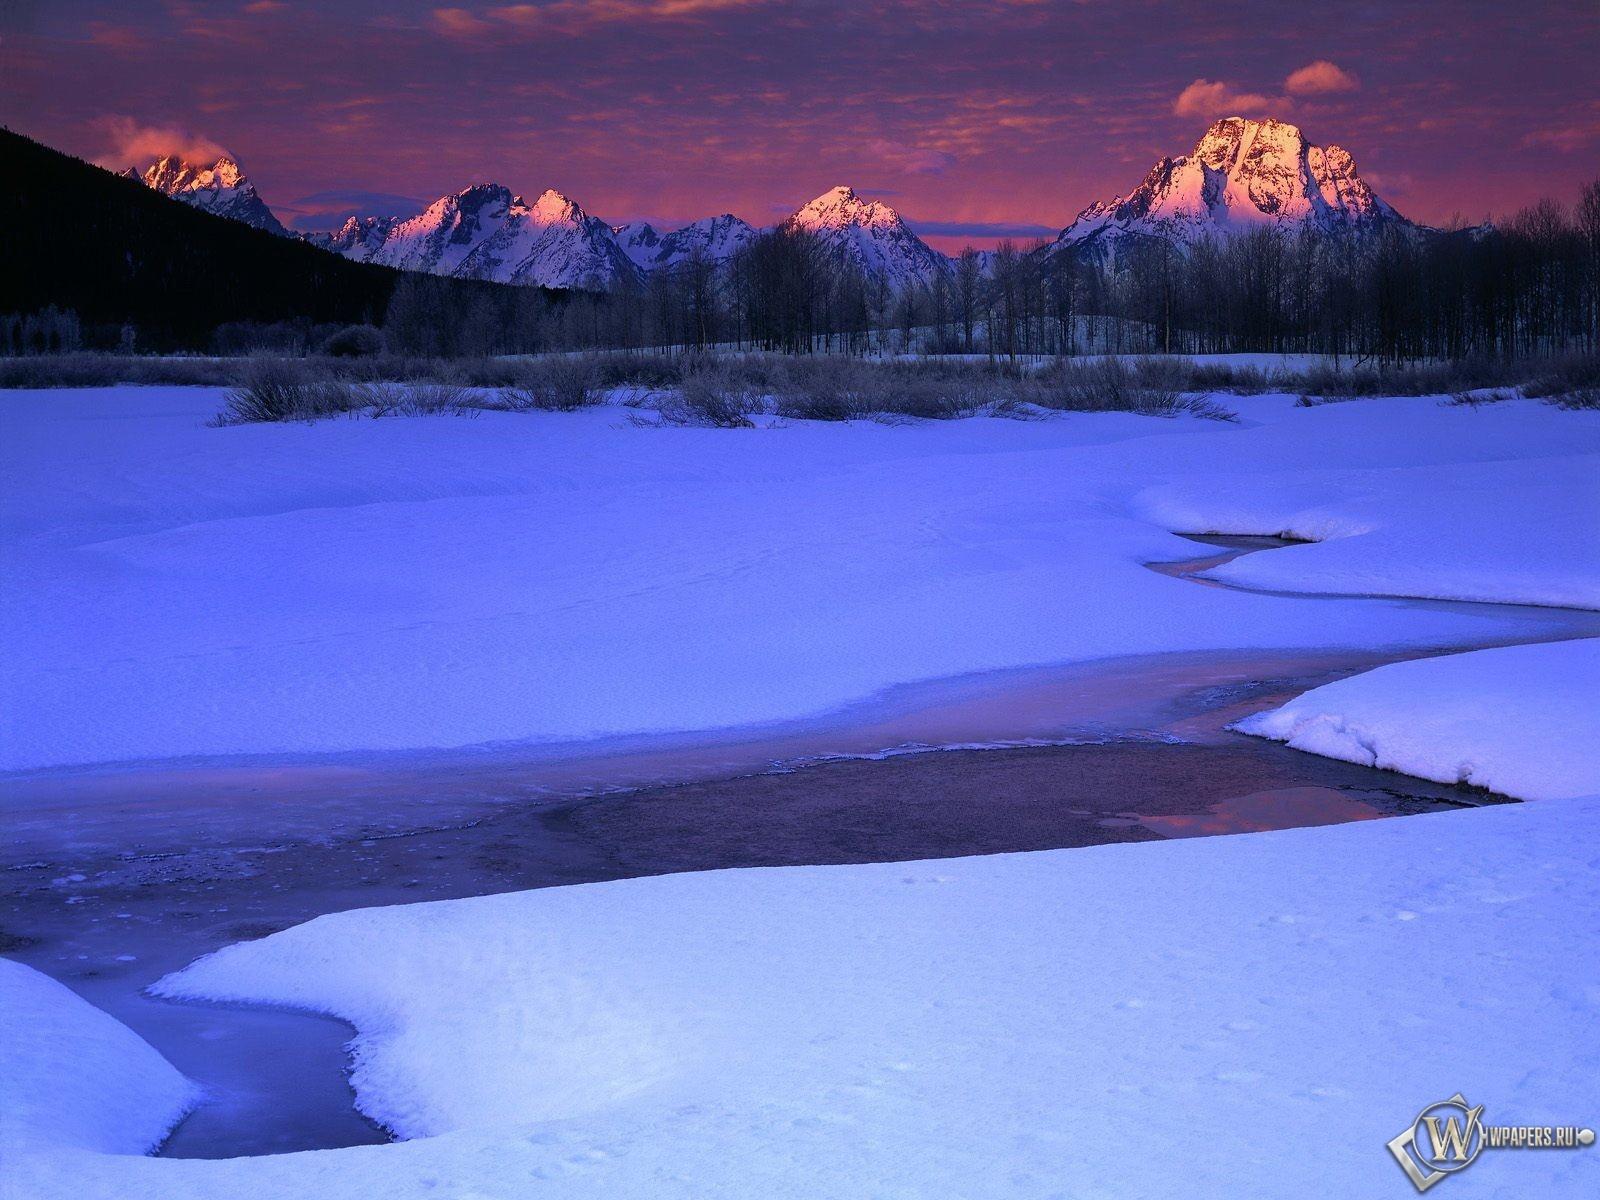 Winter Sunrise 1600x1200